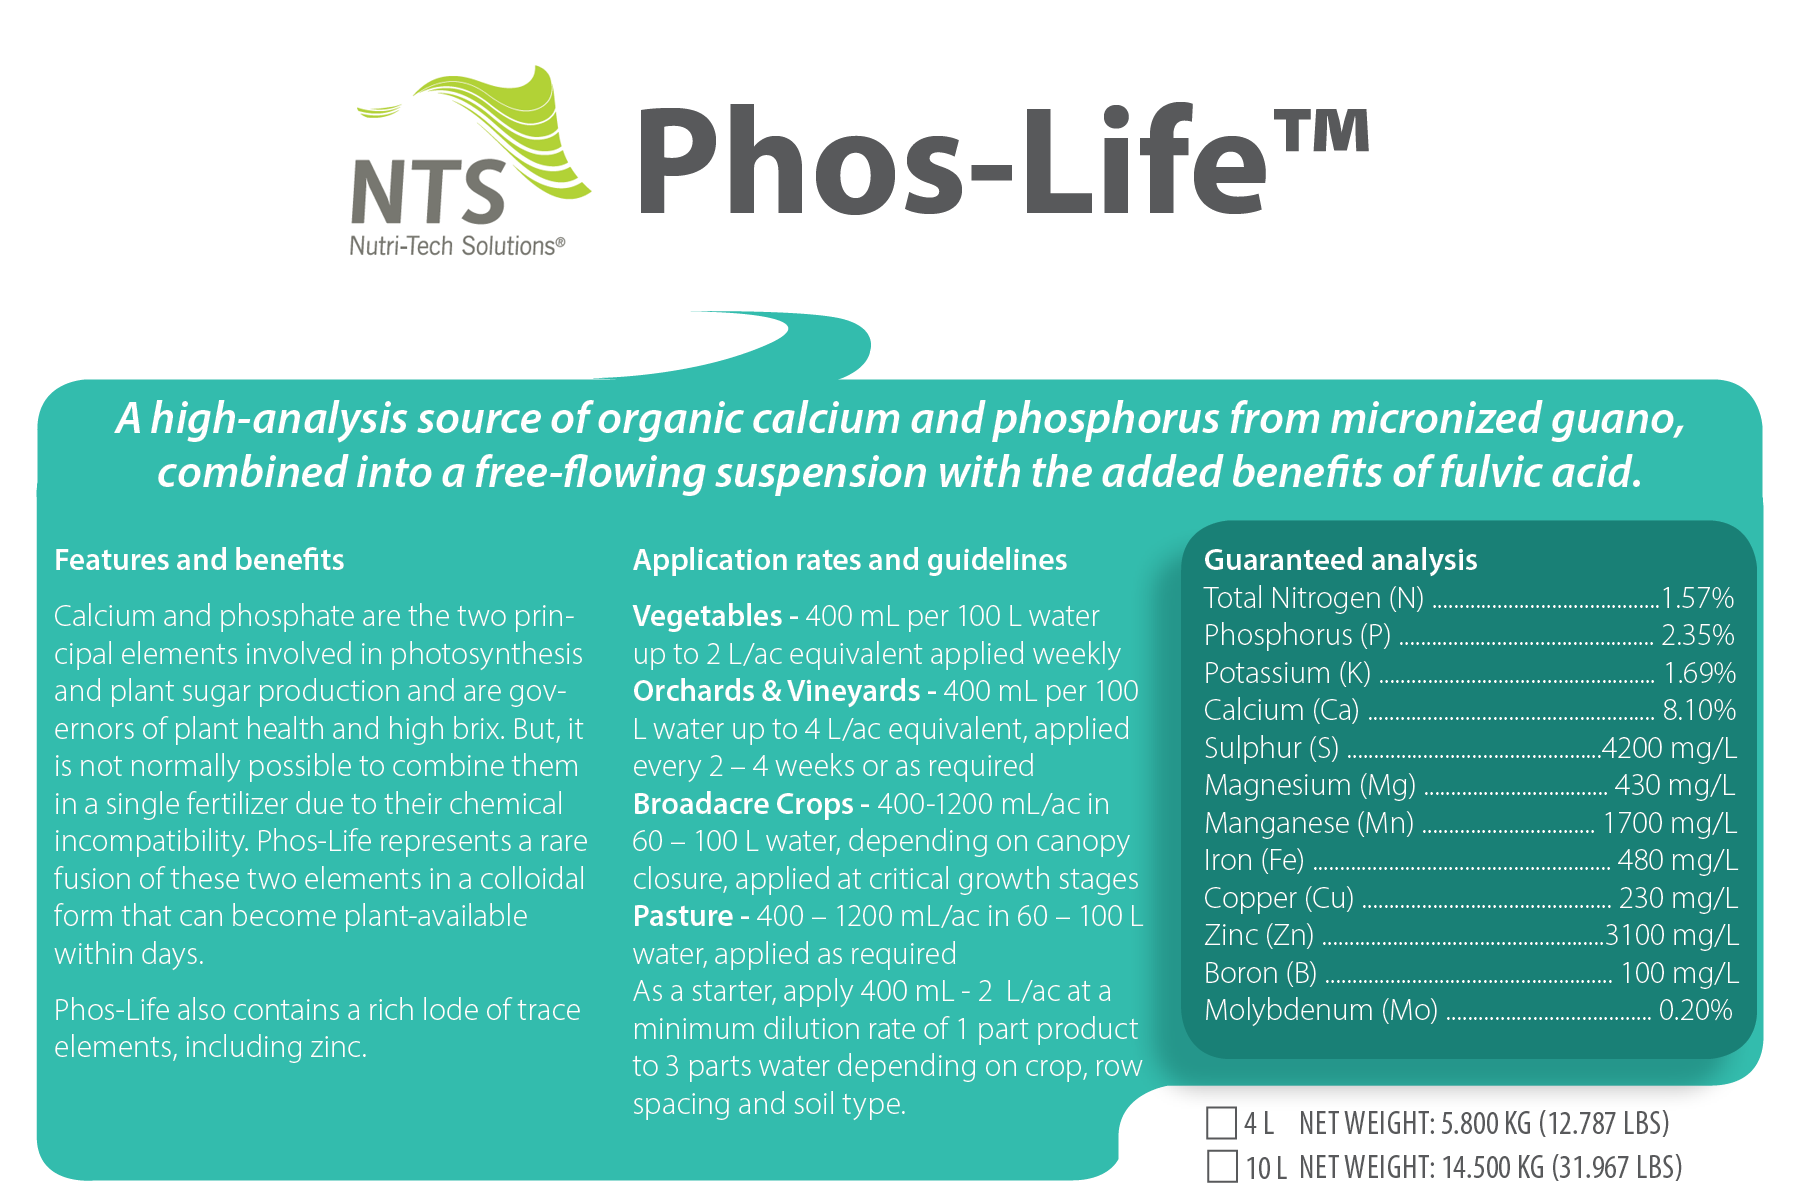 NTS Phos-Life™